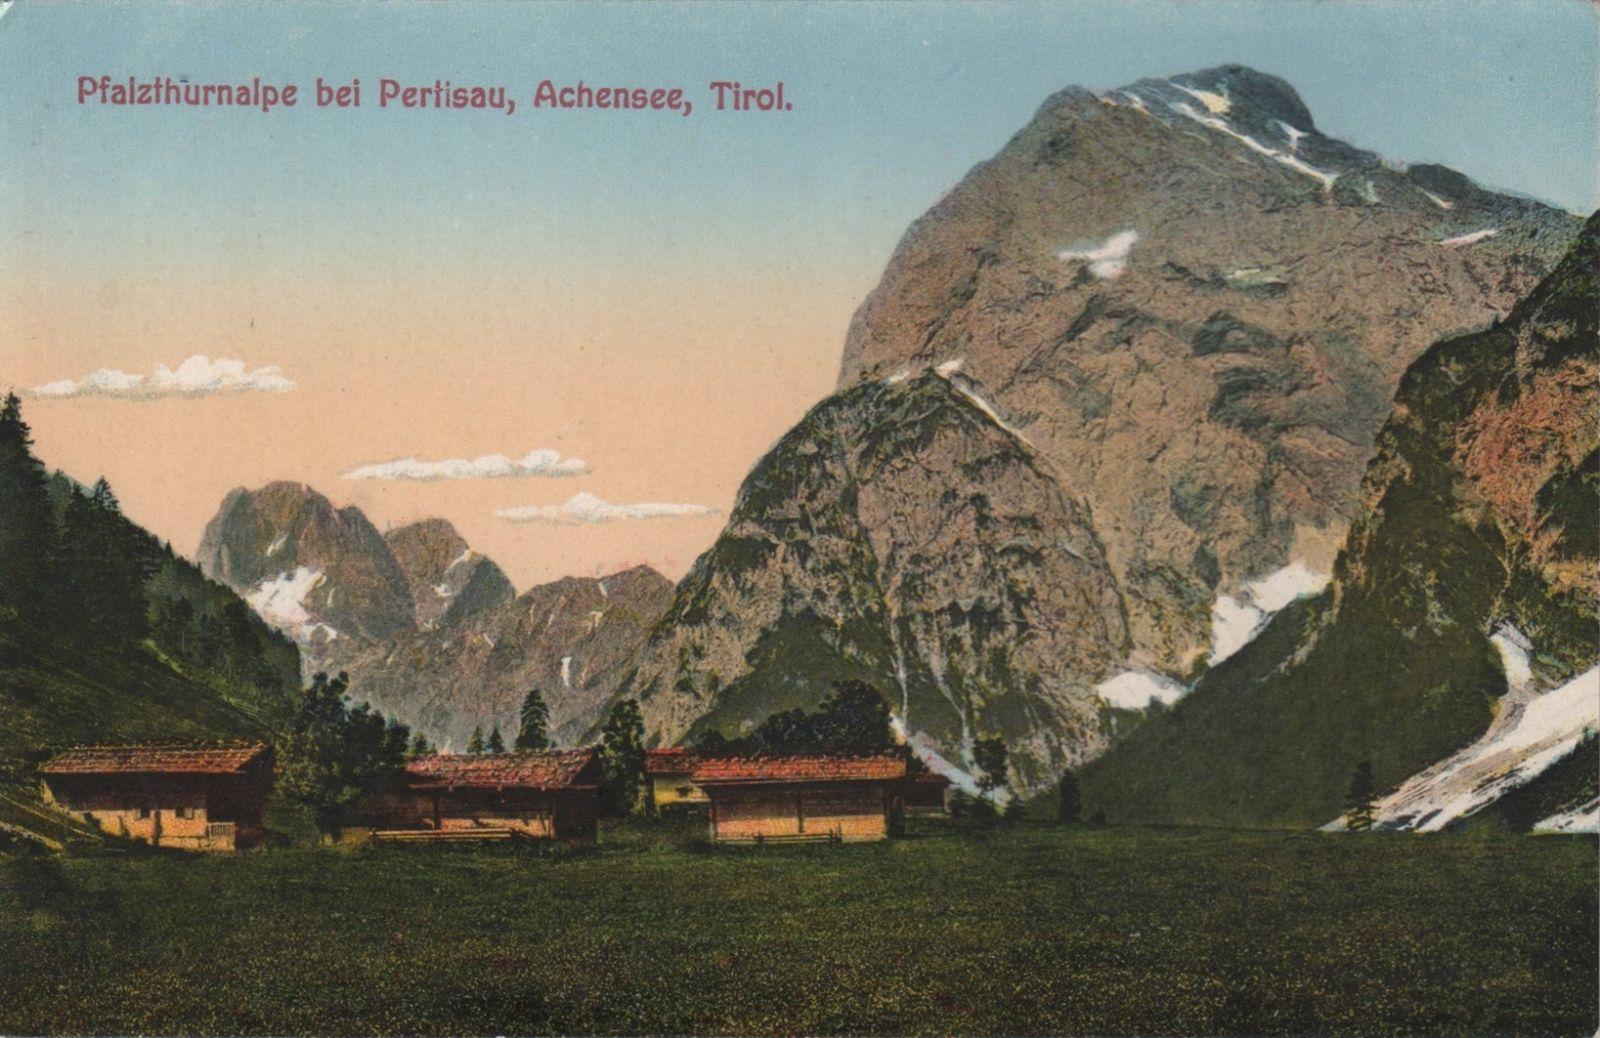 Eben Pertisau Pfalzthurnalpe